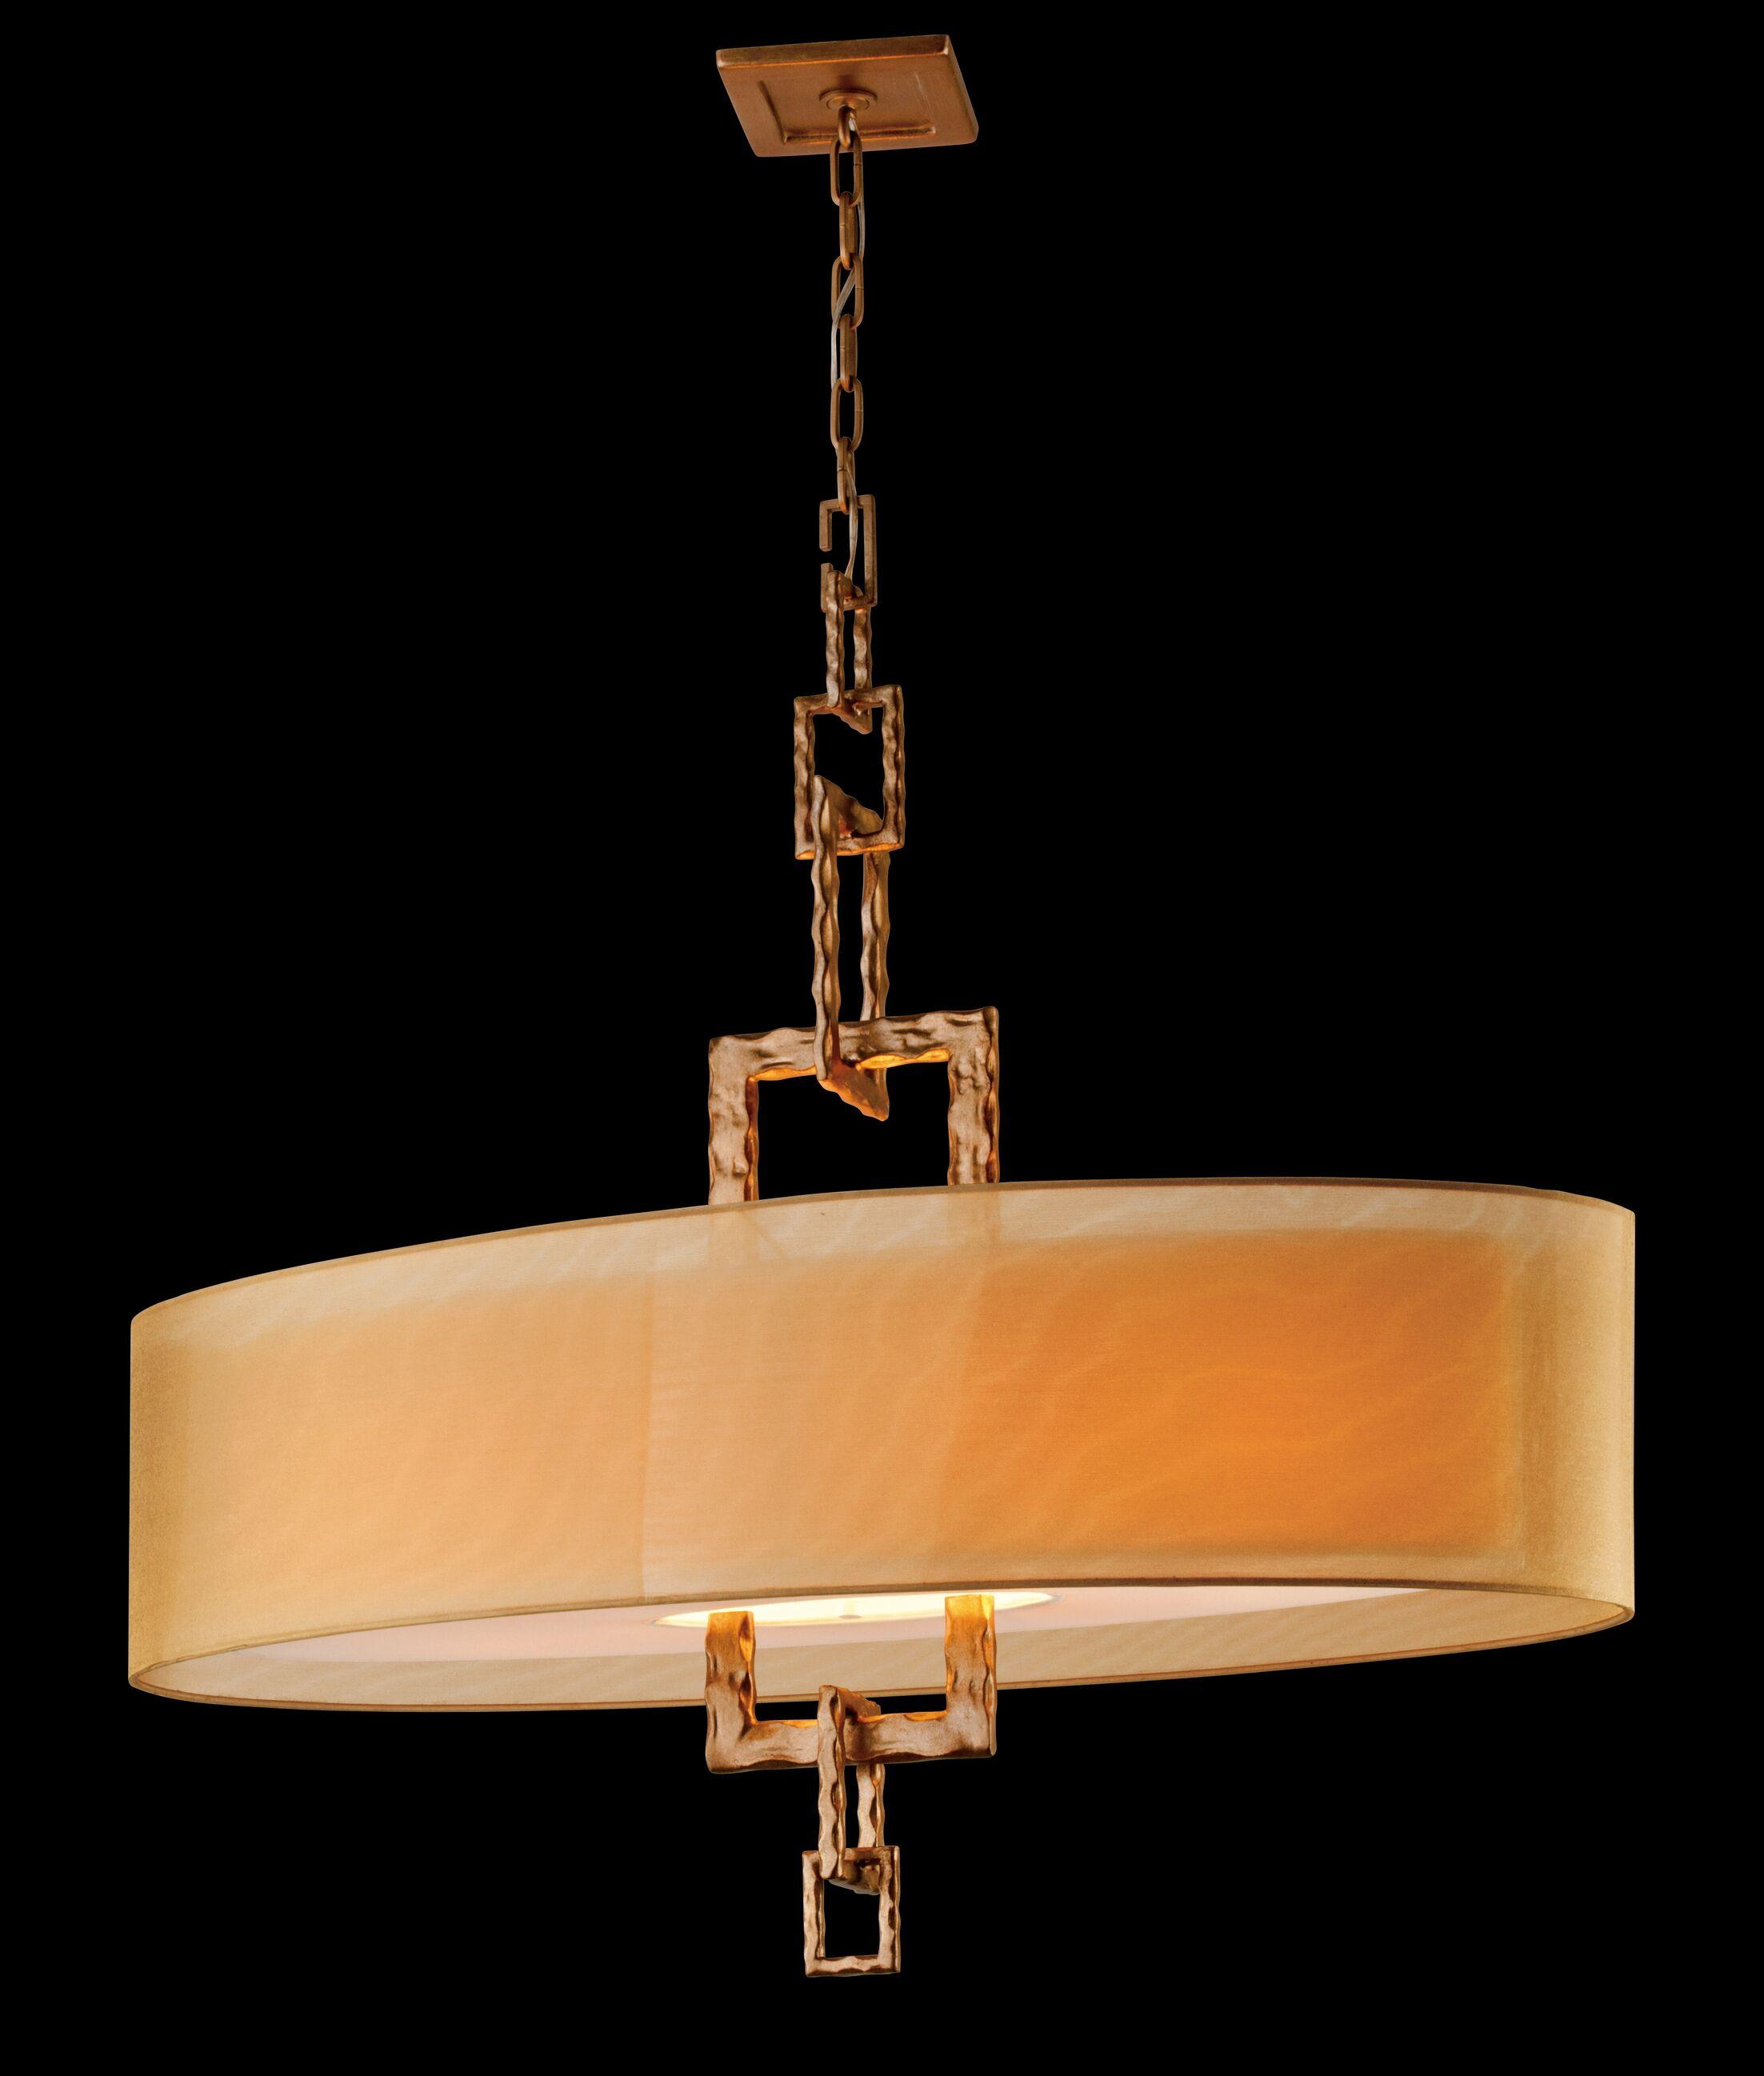 Karissa 4-Light Kitchen Island Pendant Bulb Type: 60W Medium Base Incandescent Bulb